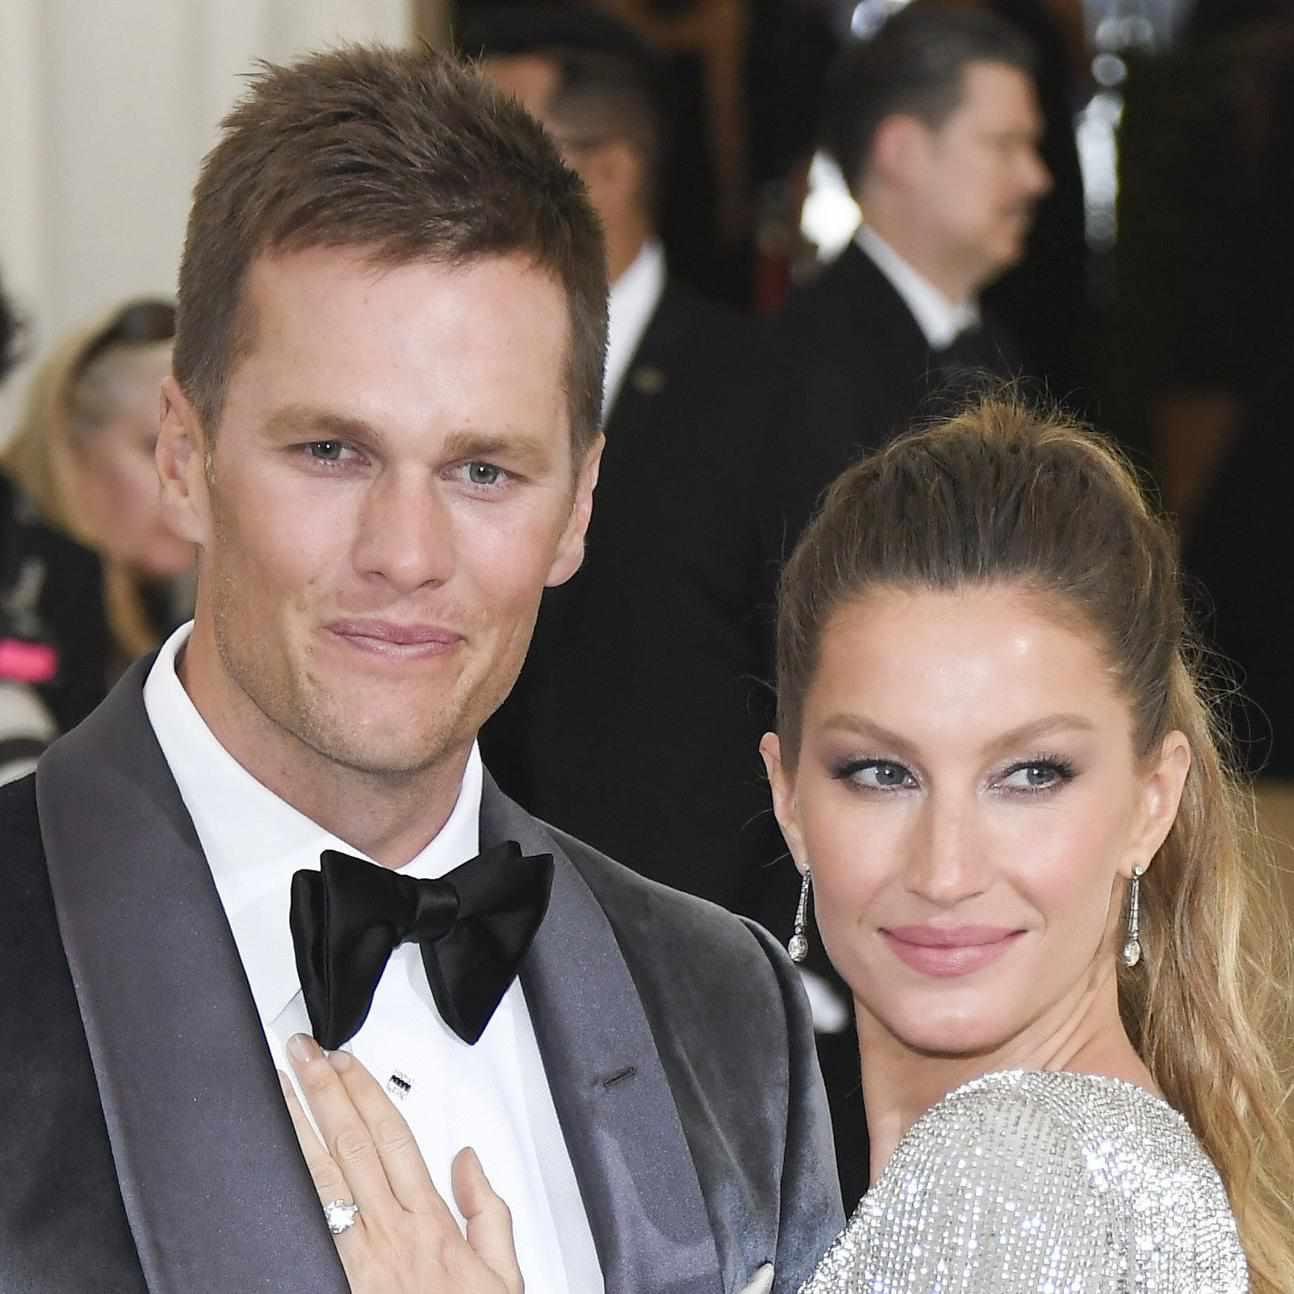 Tom Brady and Gisele Bündchen Shared a Sweet Smooch at a